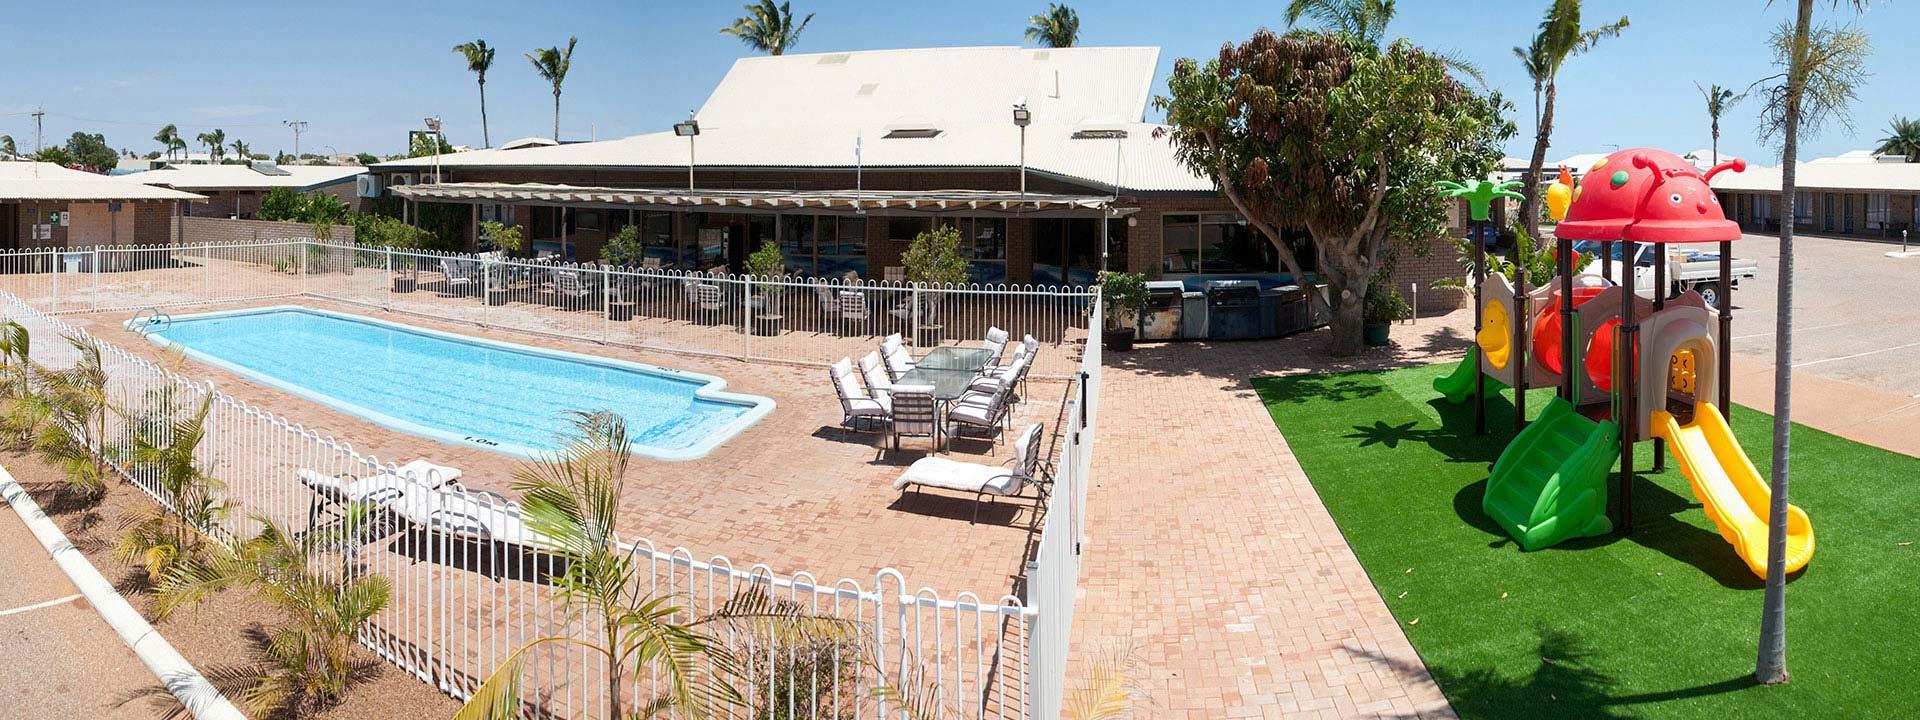 Enjoy the amazing facilities at Carnarvon Motel